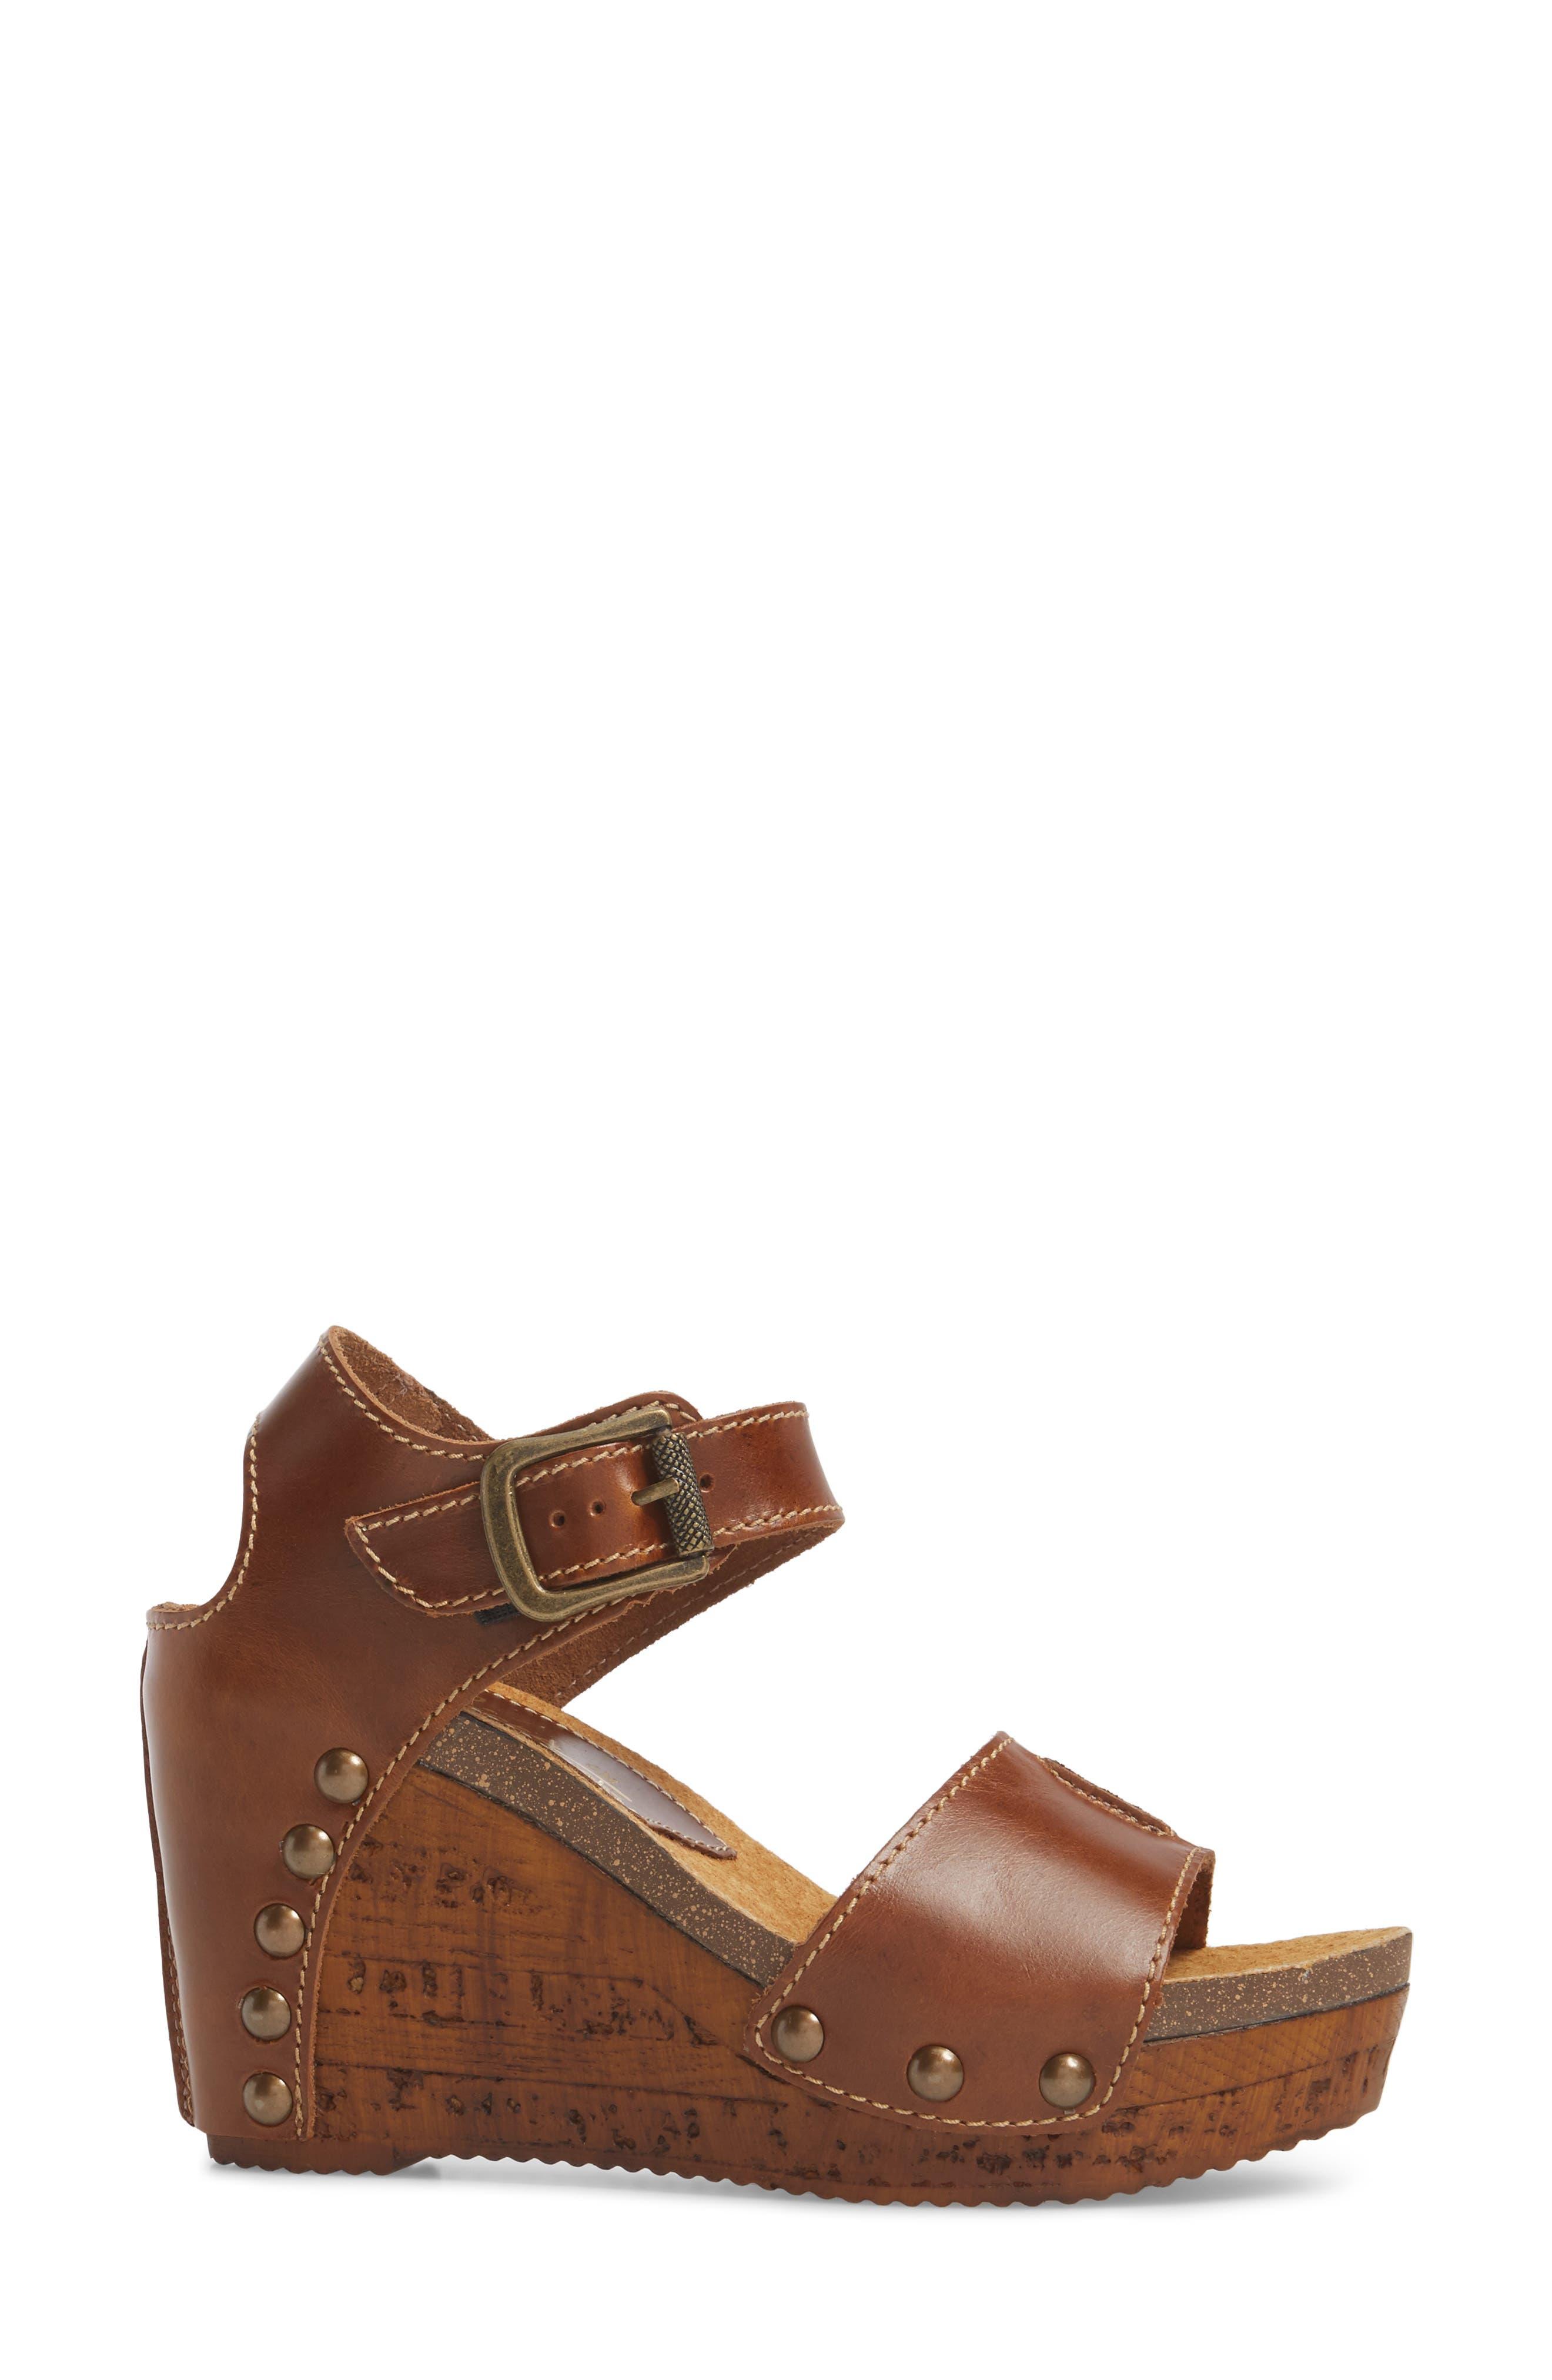 Alternate Image 3  - Sbicca Brella Studded Platform Wedge Sandal (Women)